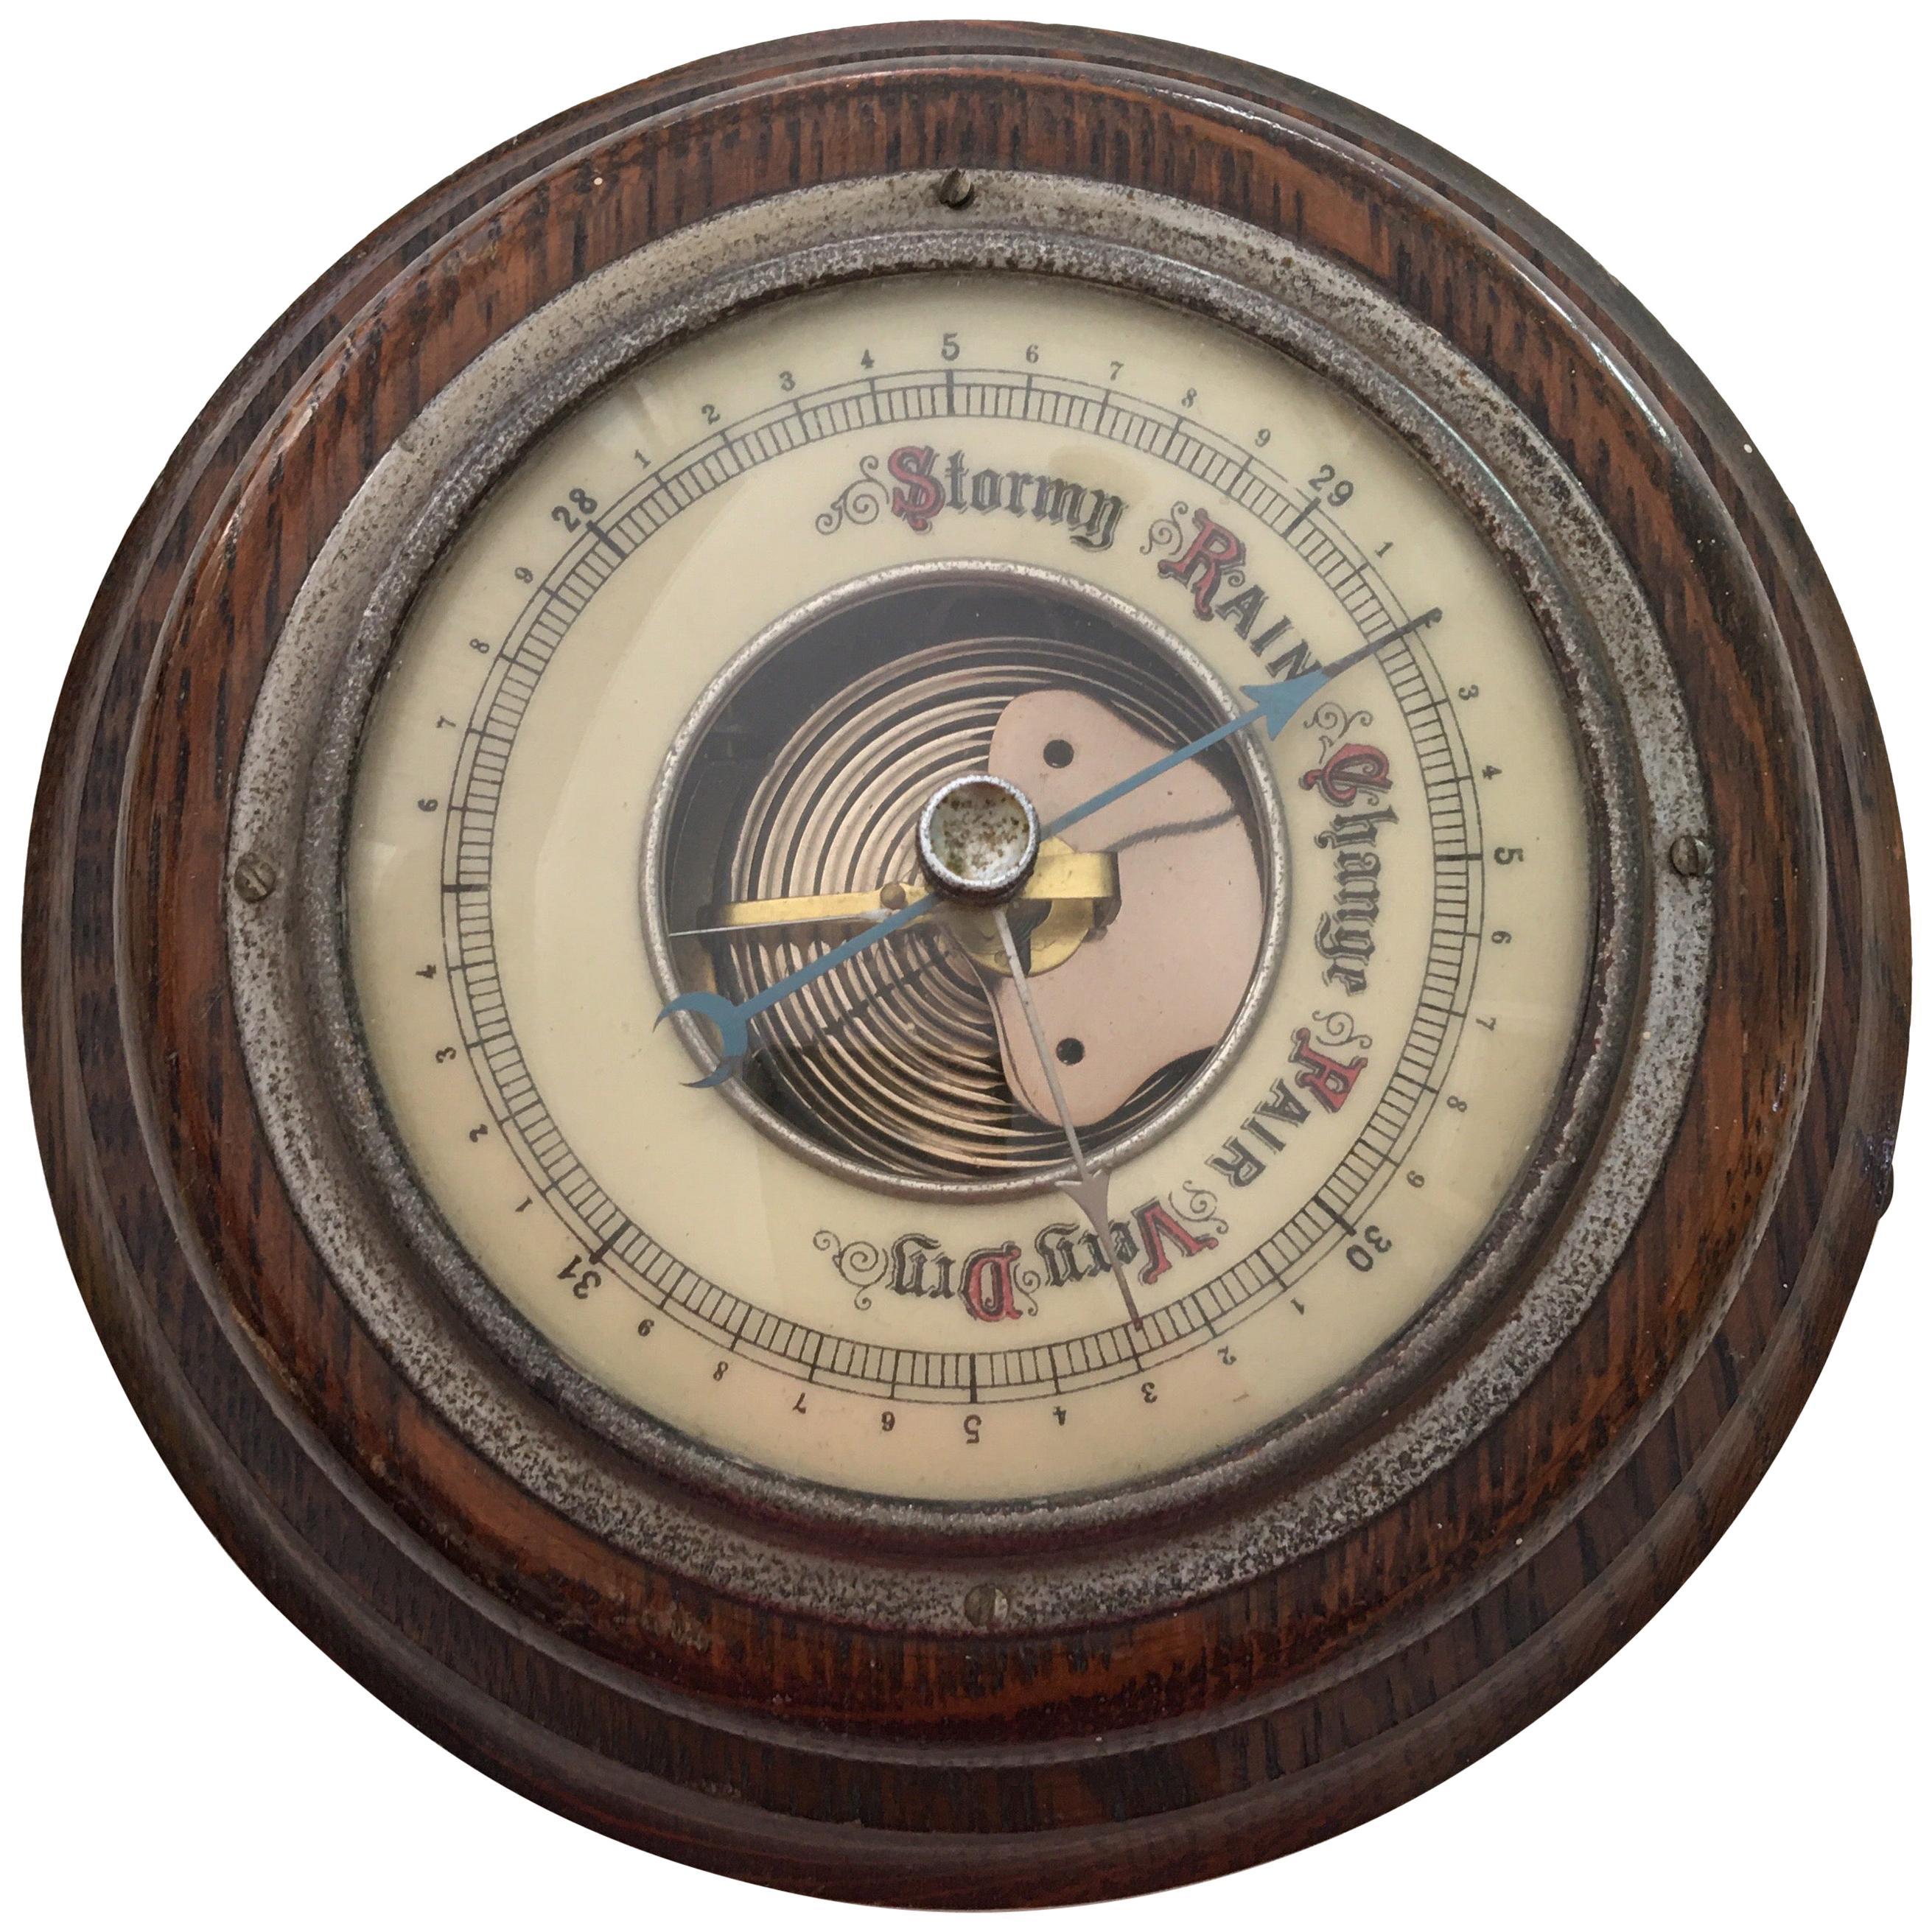 Antique Oakwood Wall Barometer